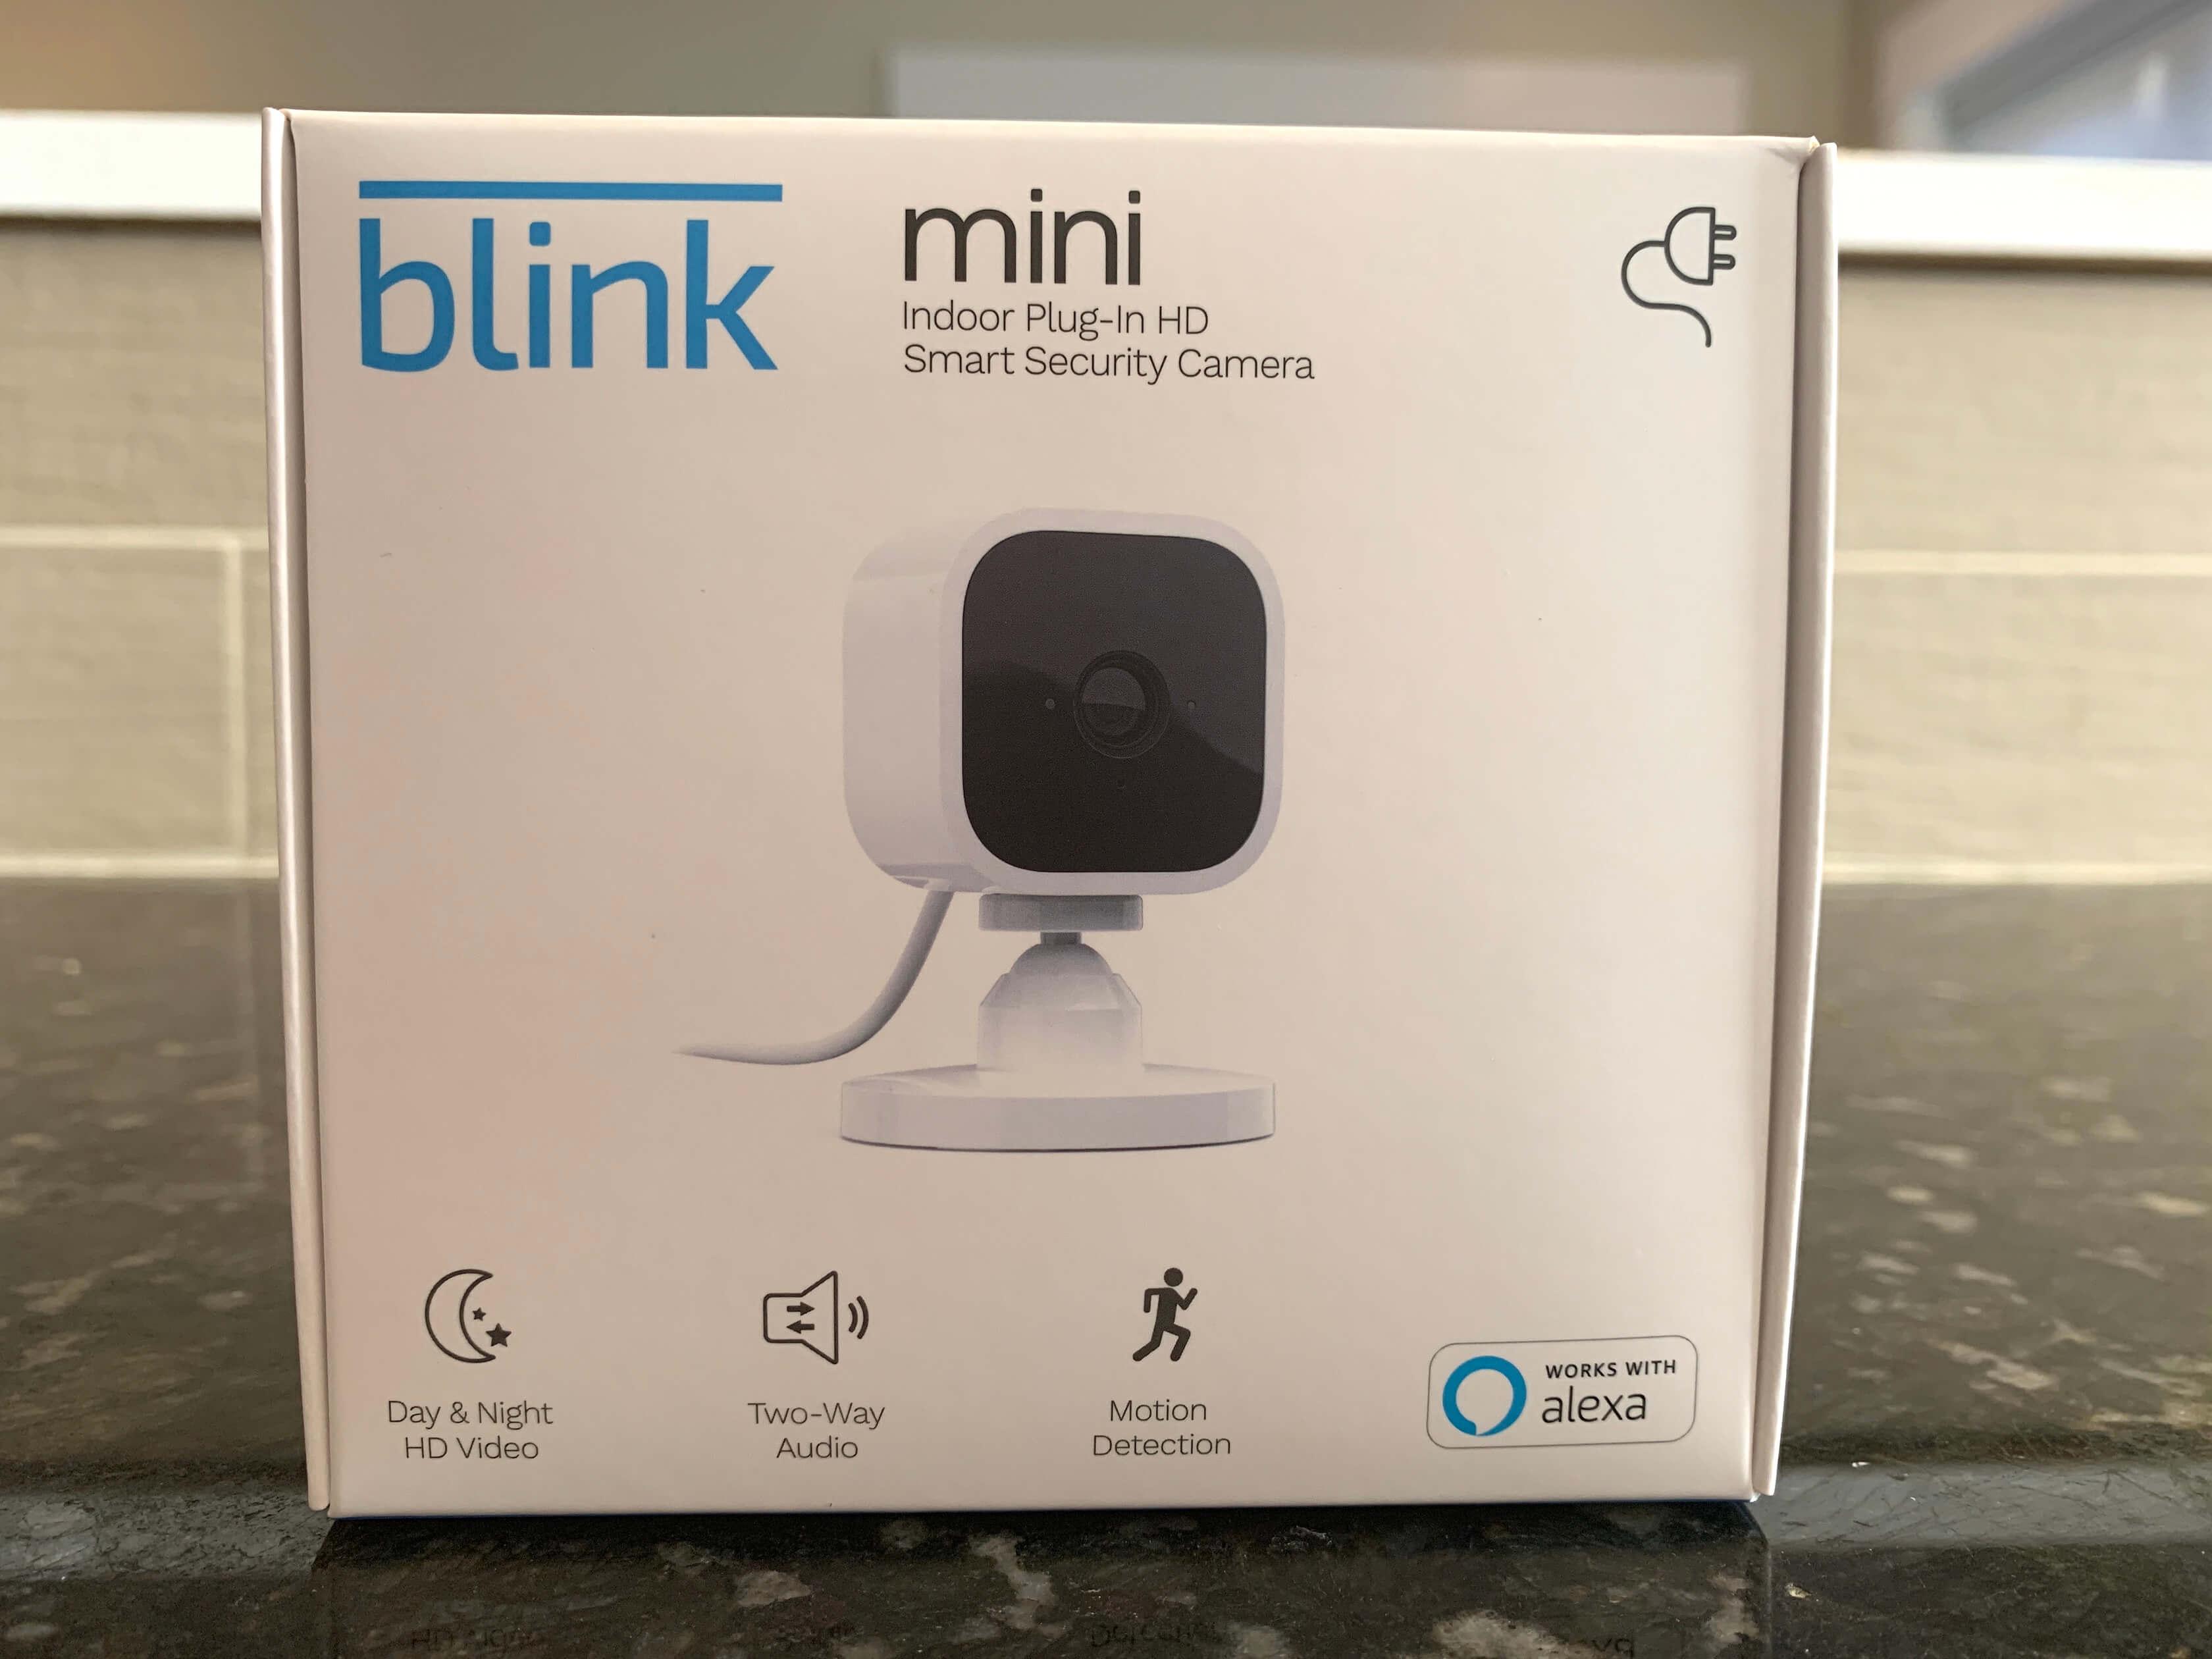 Blink Mini box on a countertop